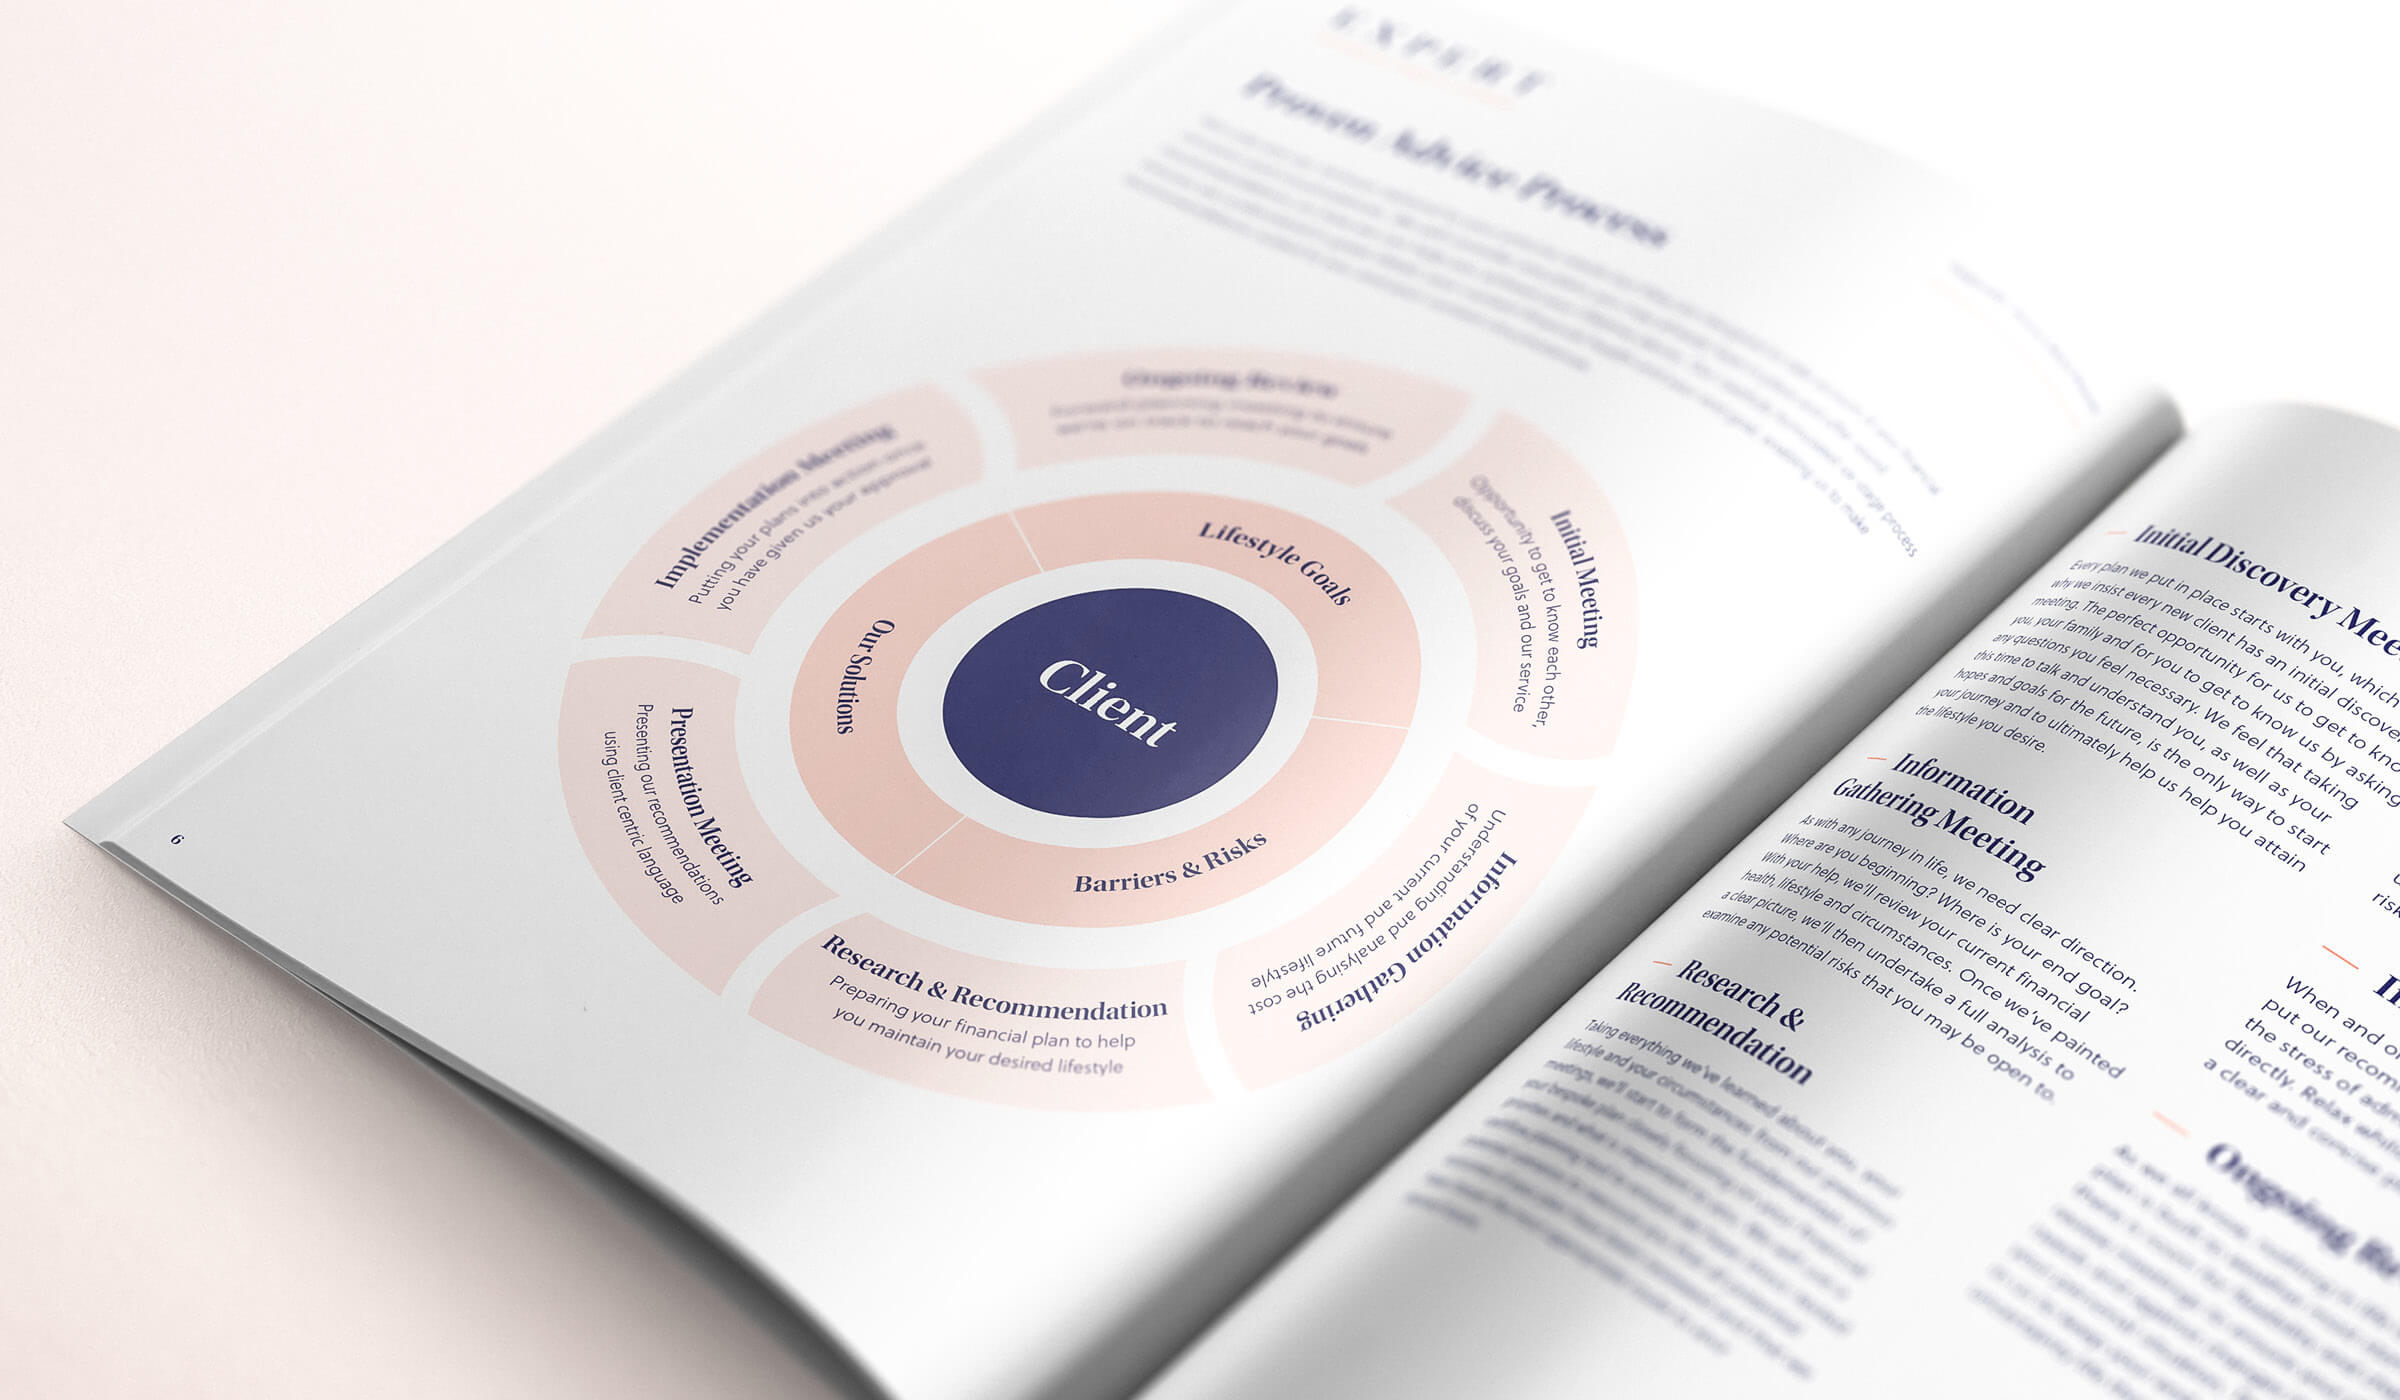 Brochure design spread and cover